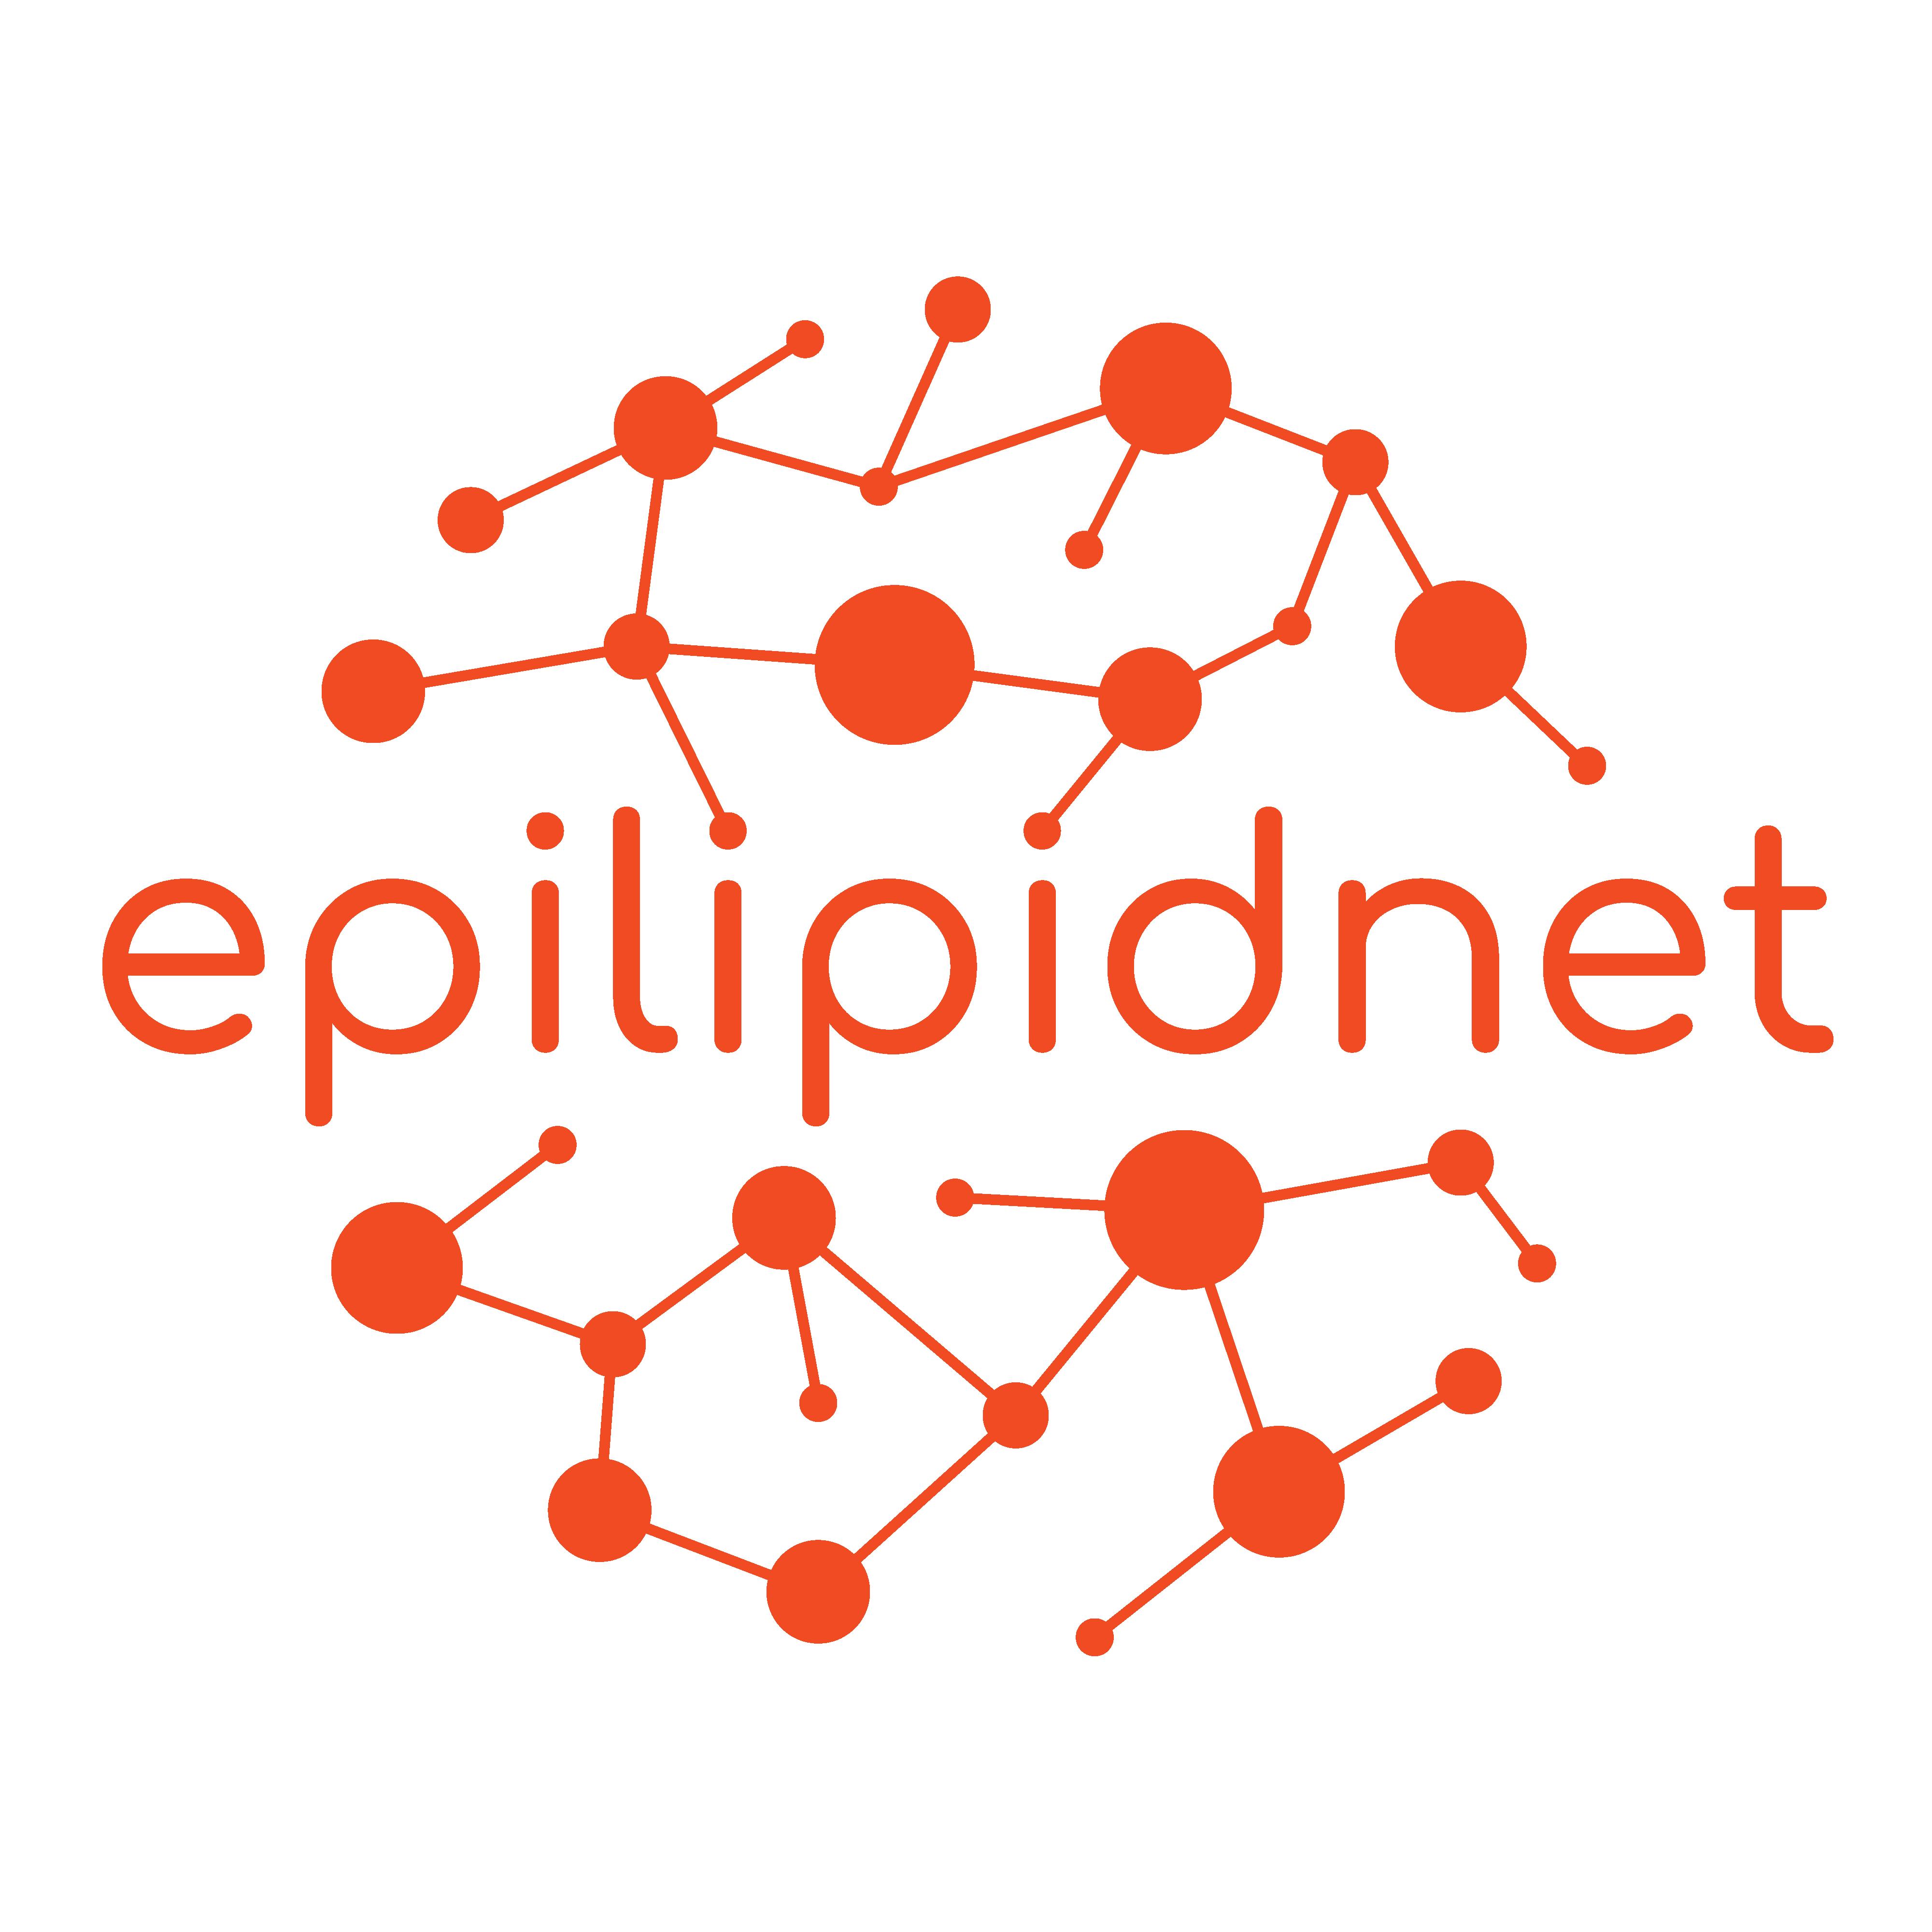 Epilipidnet Logo